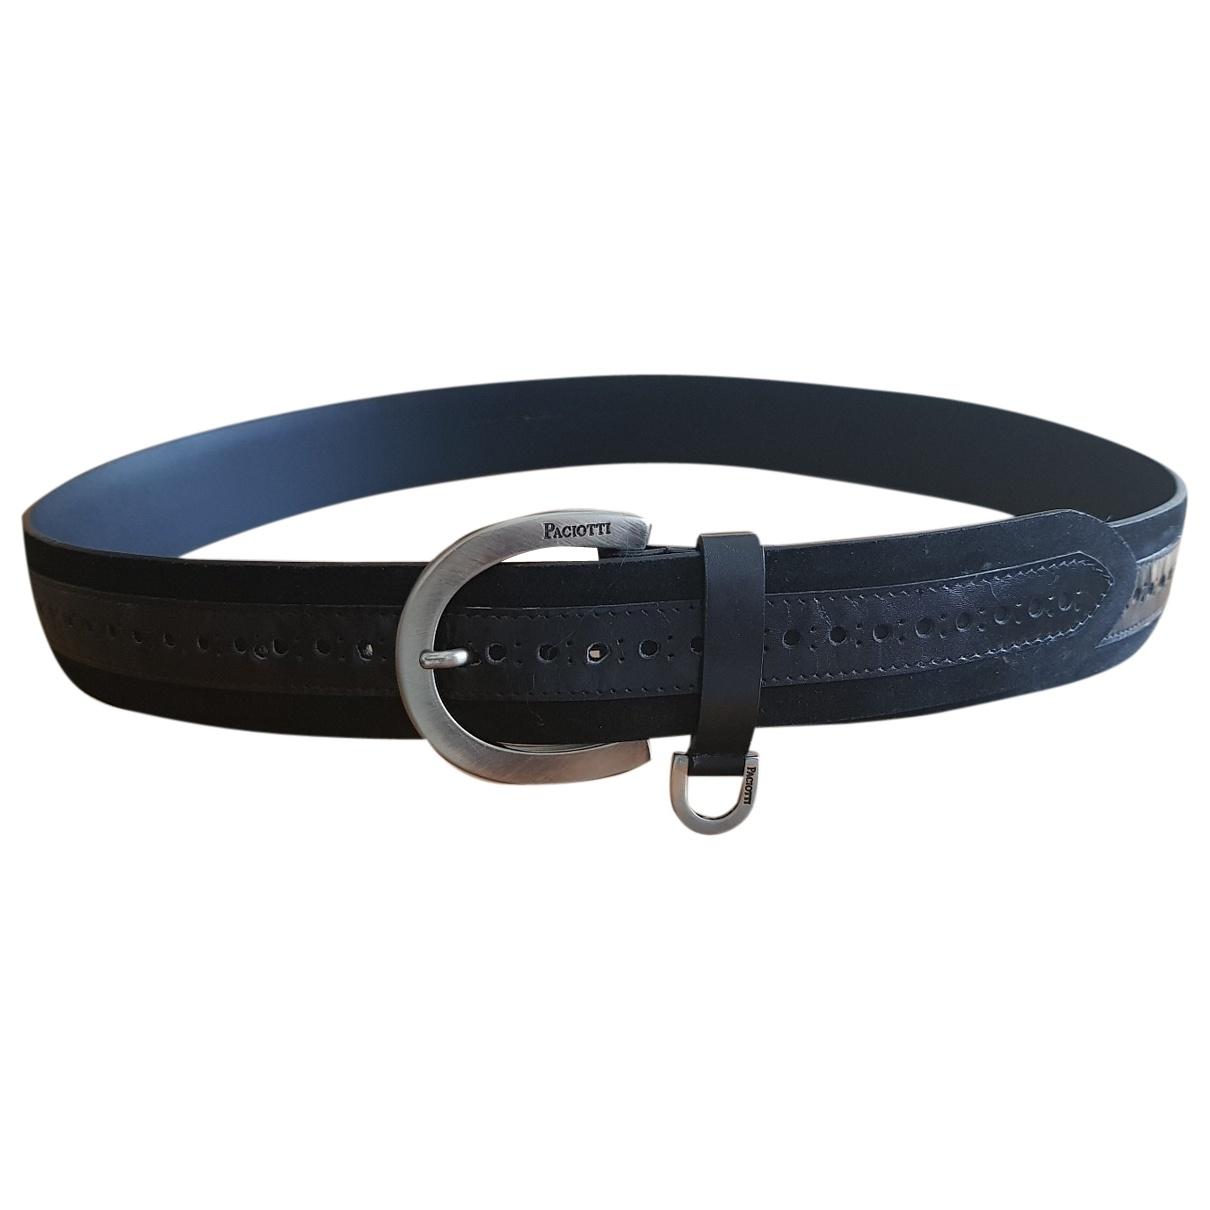 Cesare Paciotti \N Black Leather belt for Men 100 cm